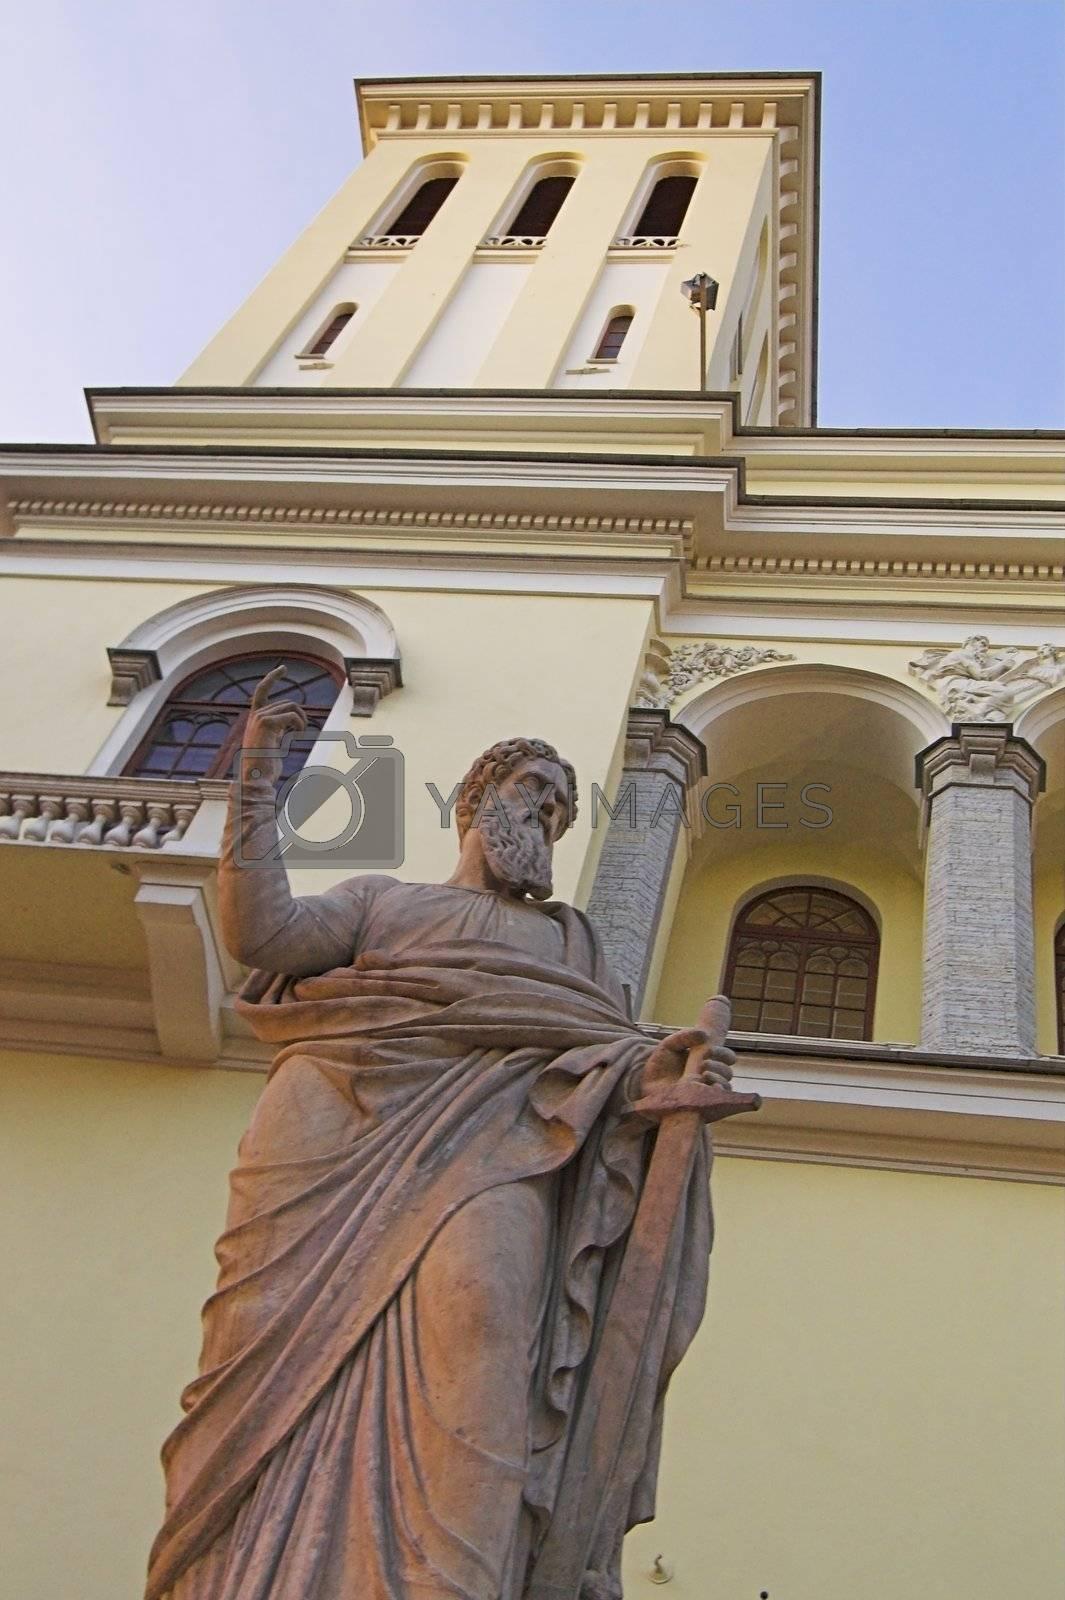 Saint Peter's Sculpture by simfan